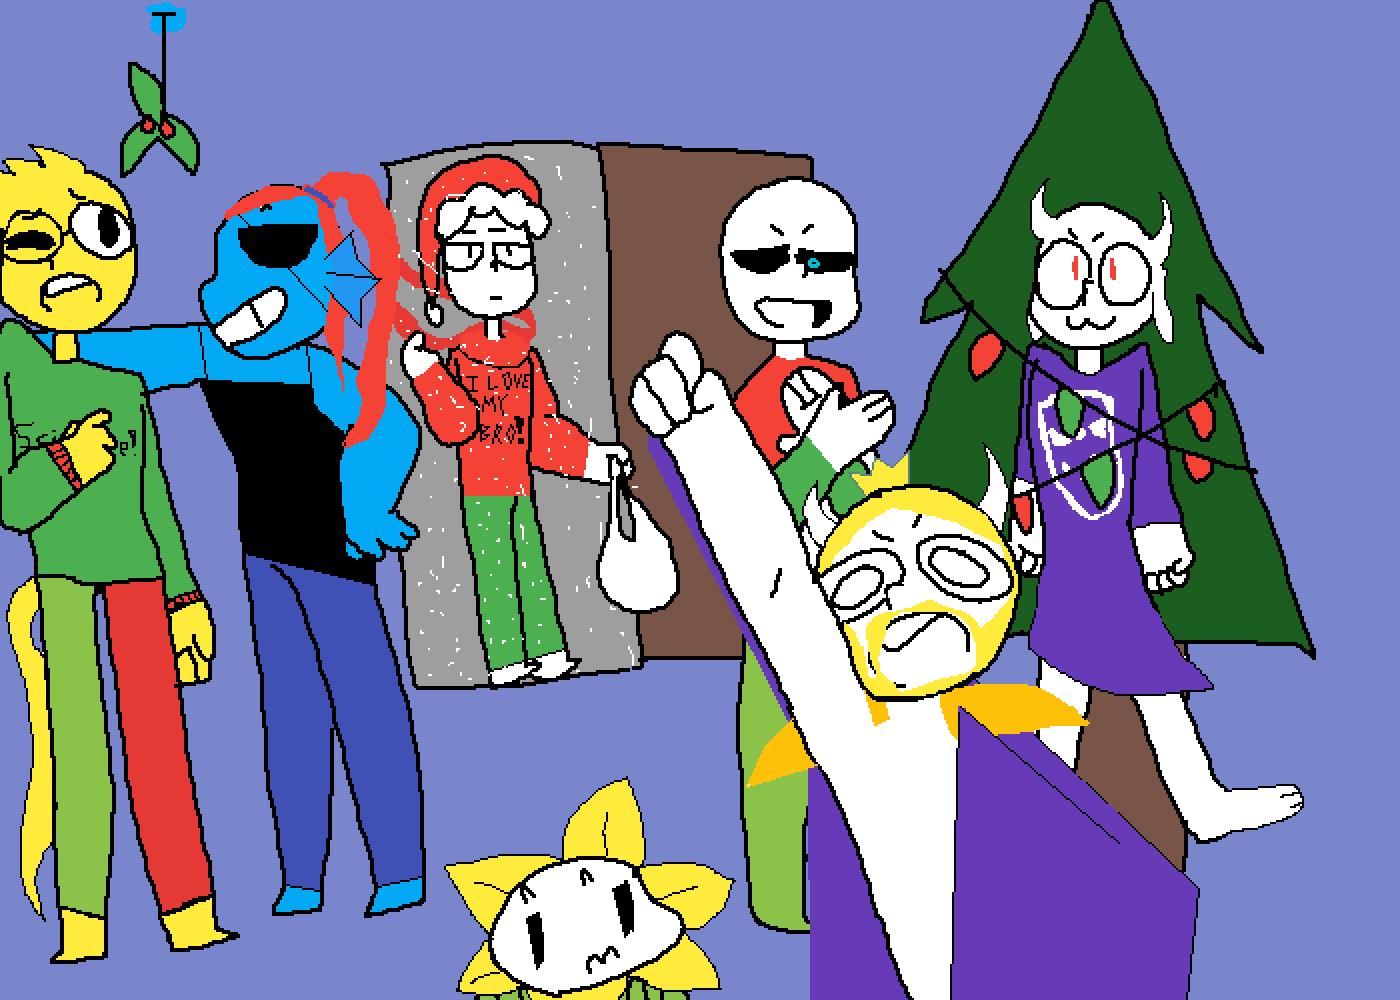 Undertale Christmas.Pixilart An Undertale Christmas By Slime Tale